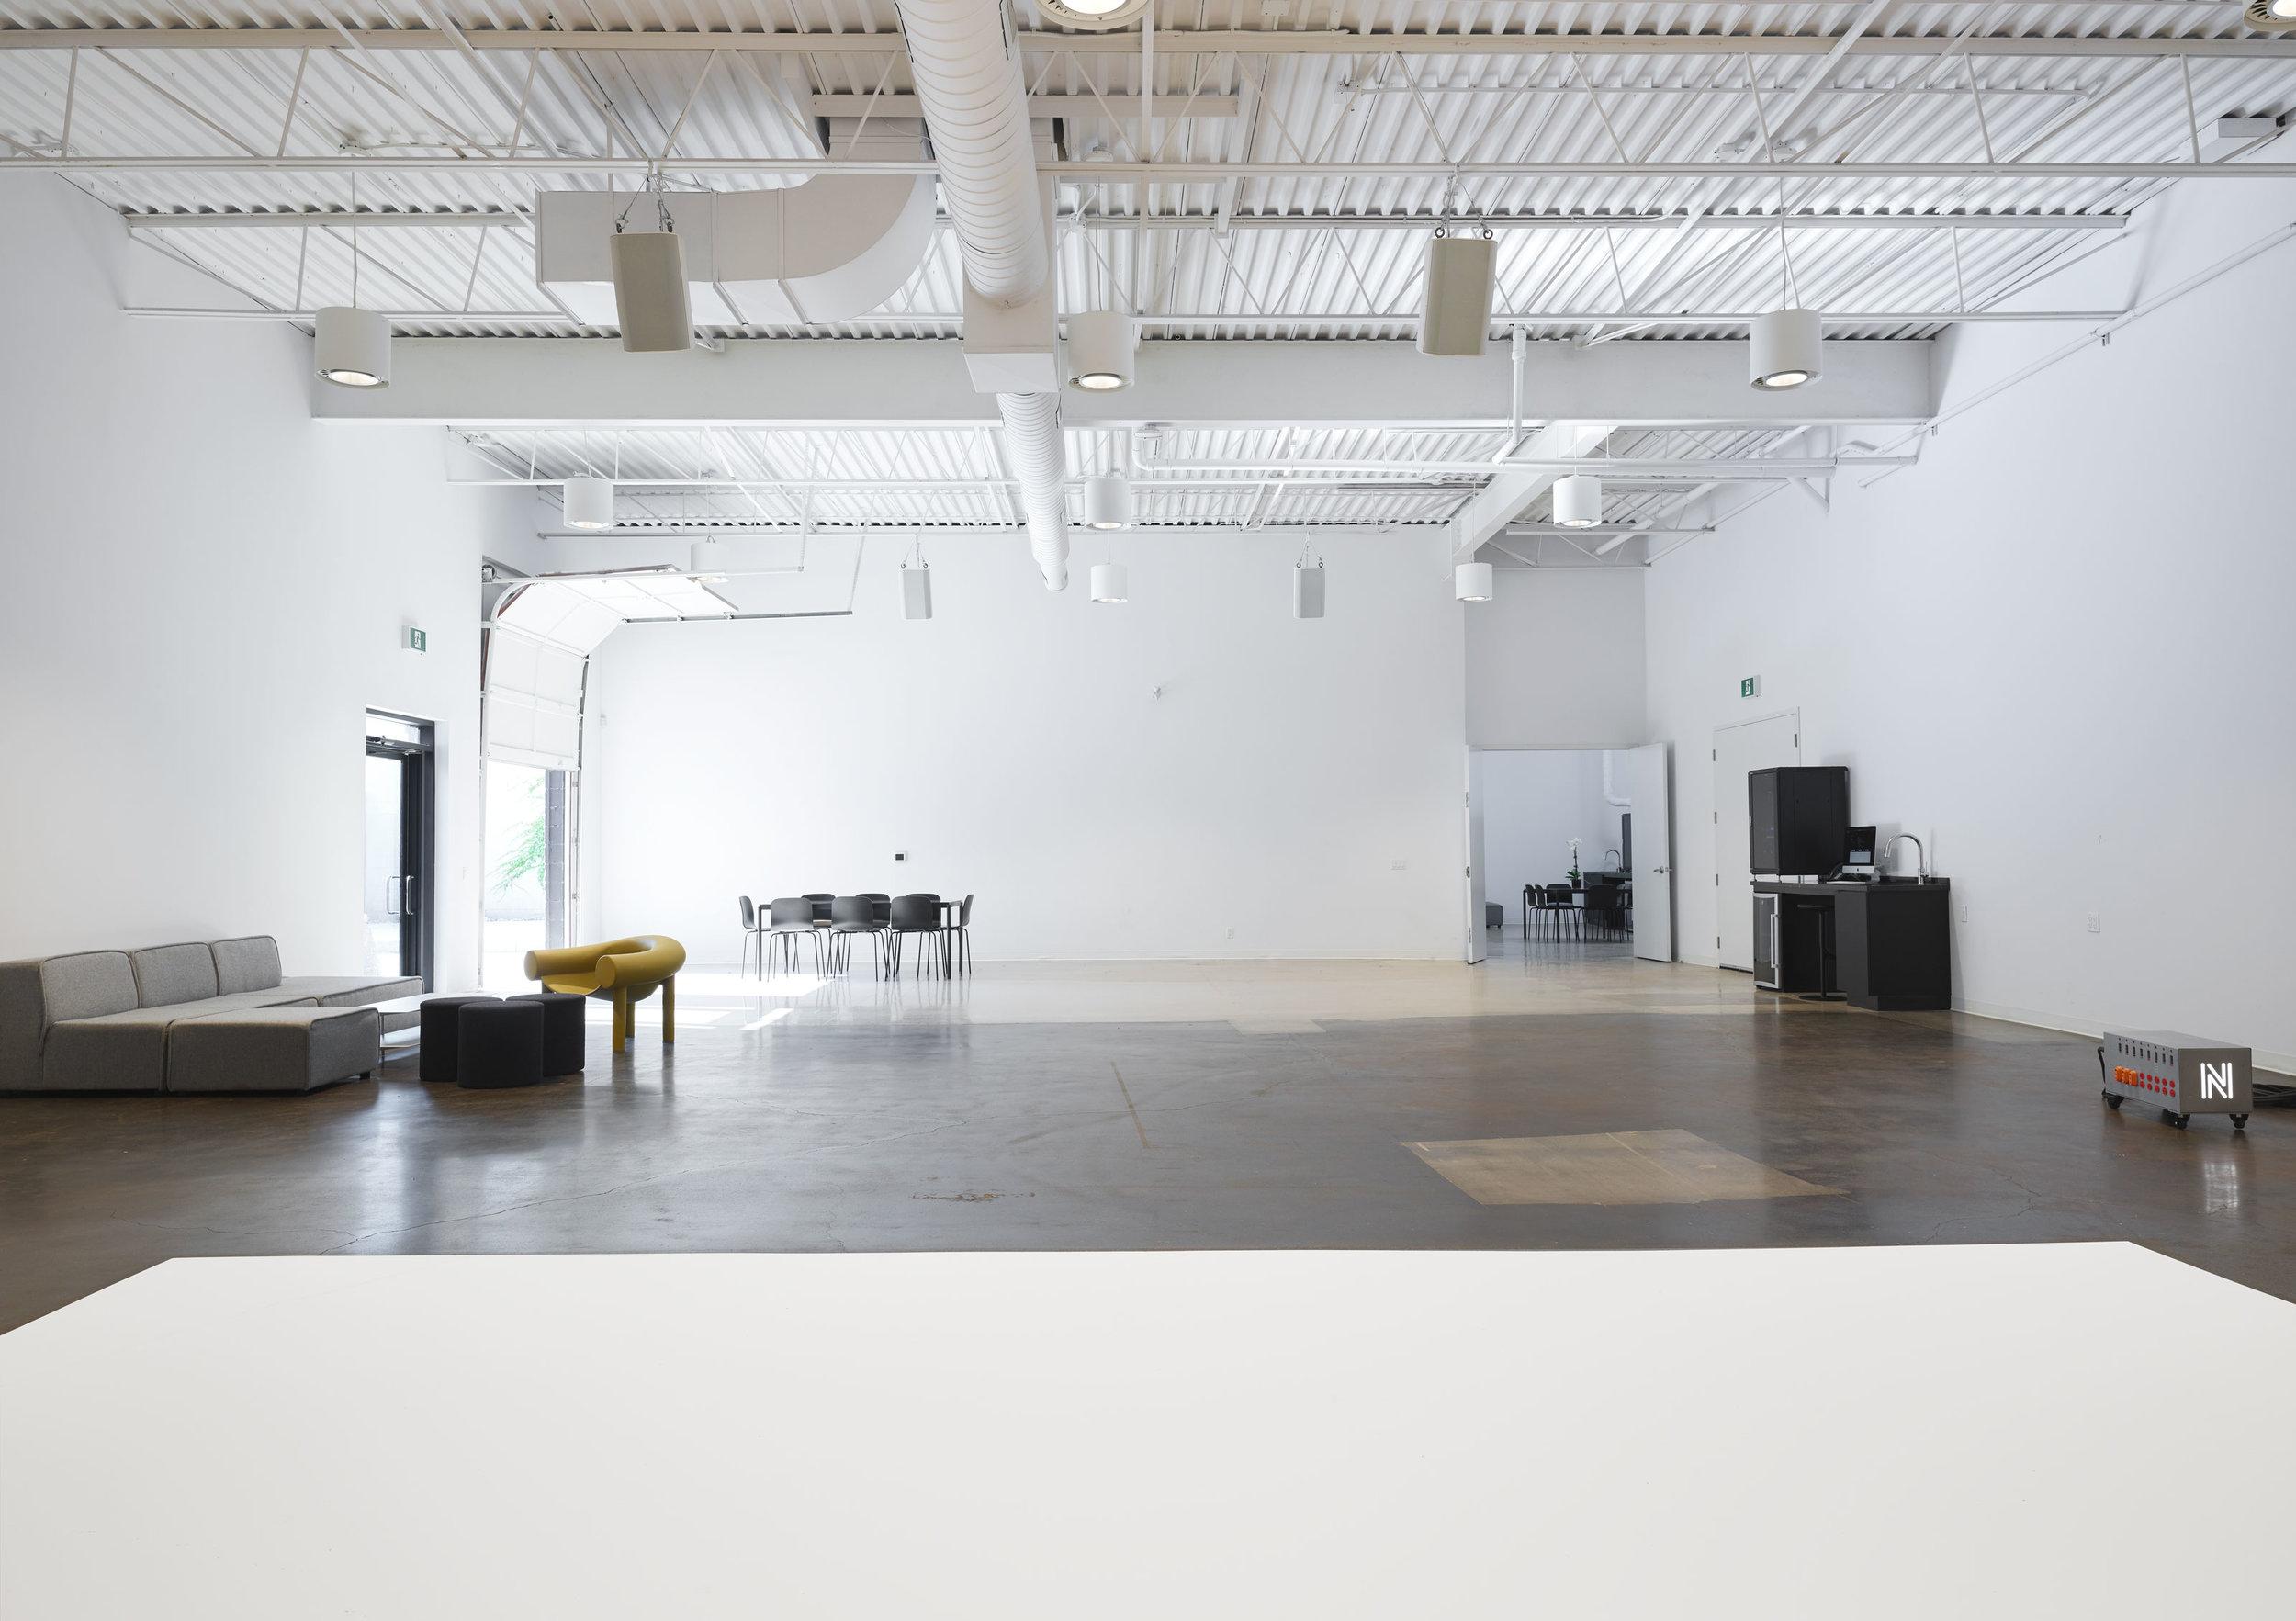 Studio 1 and 2